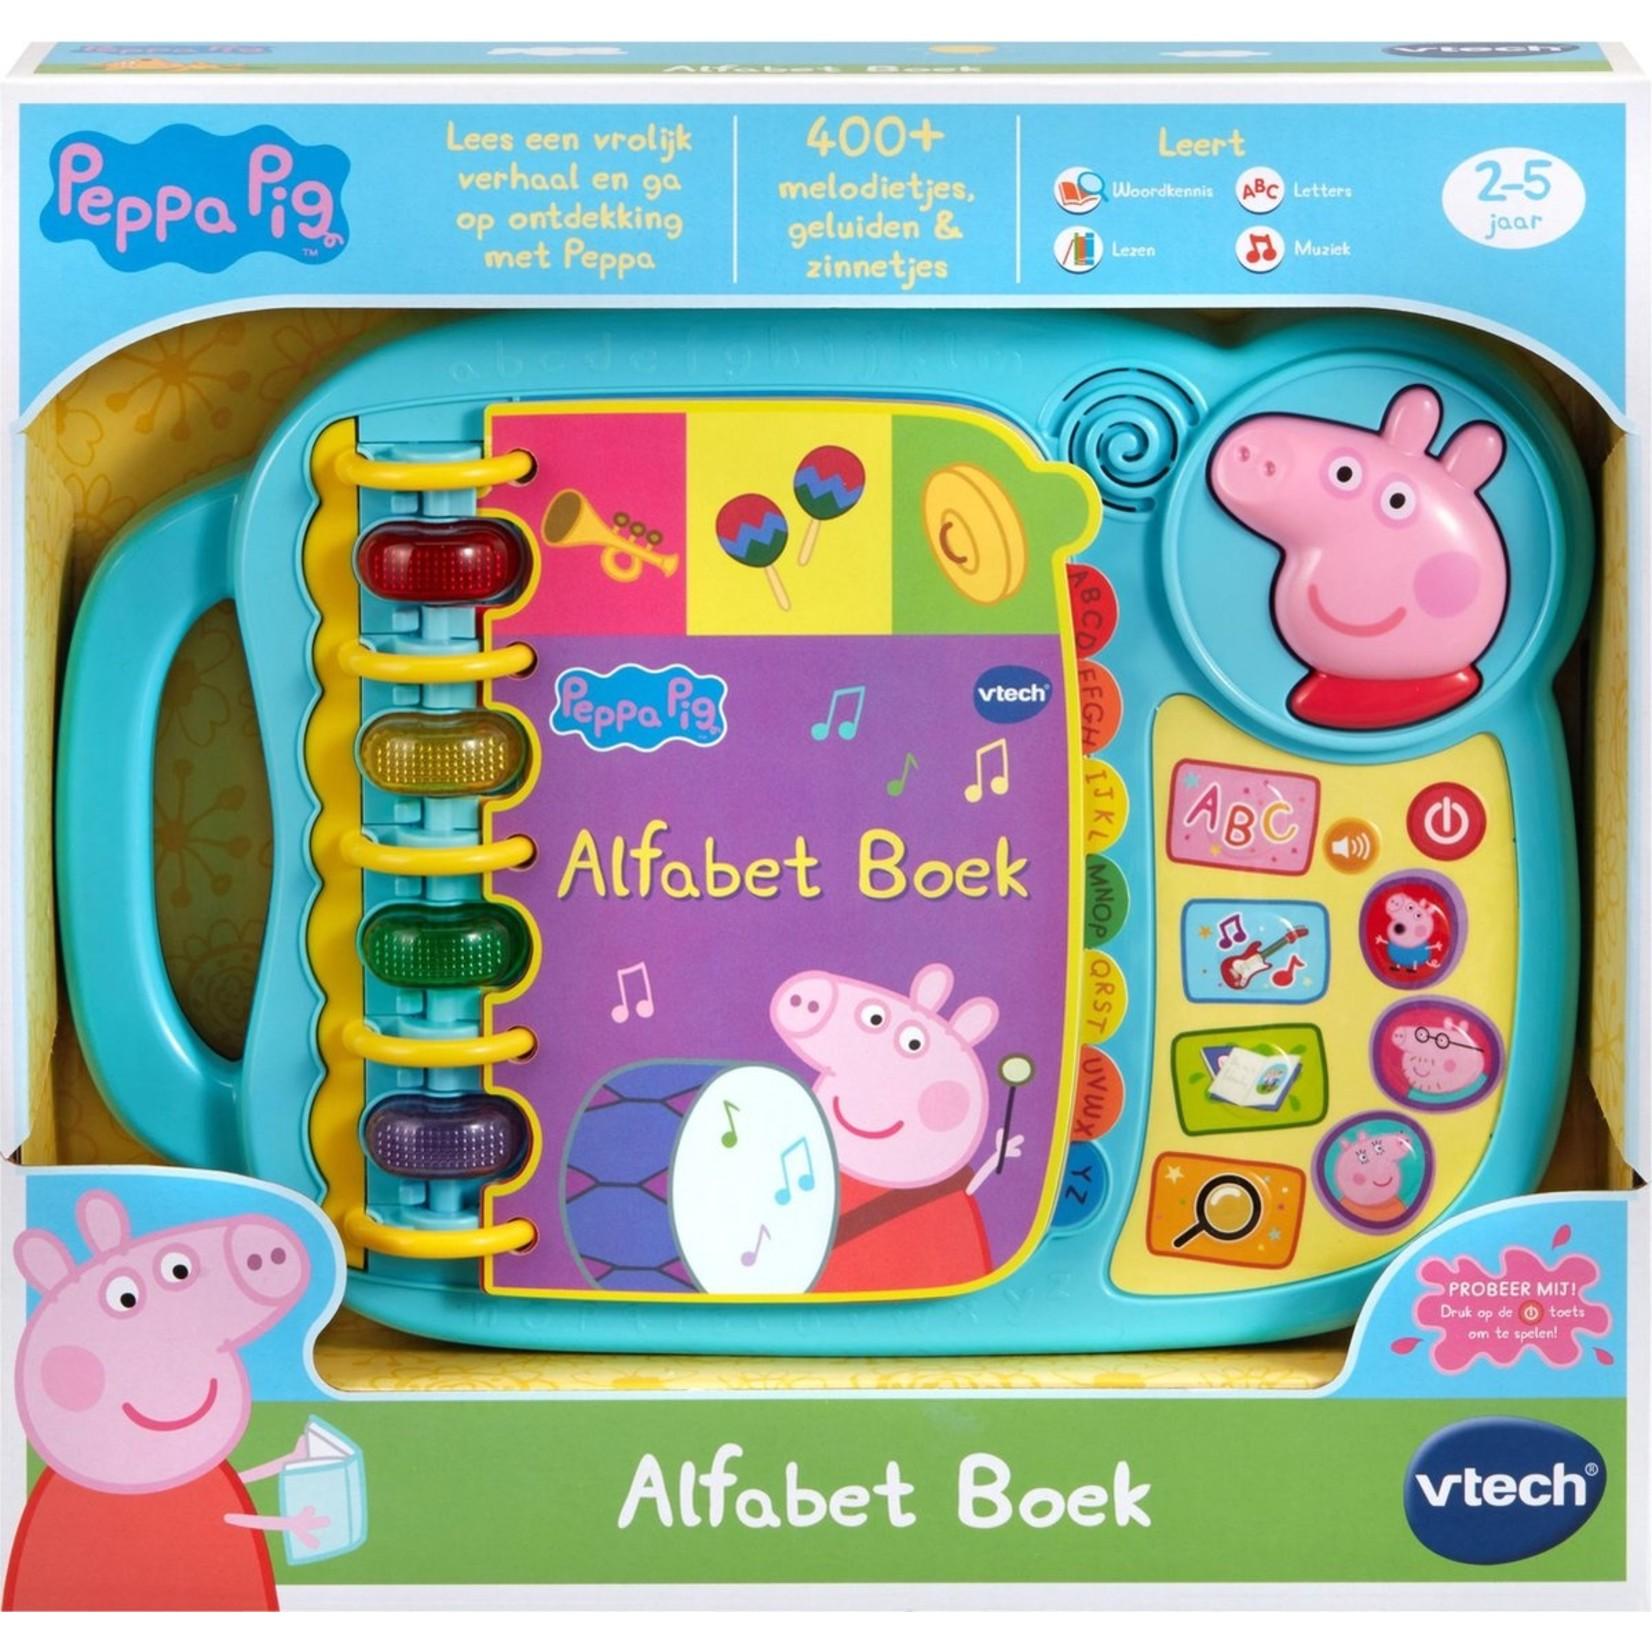 VTECH Peppa Pig VTECH Alfabet Boek